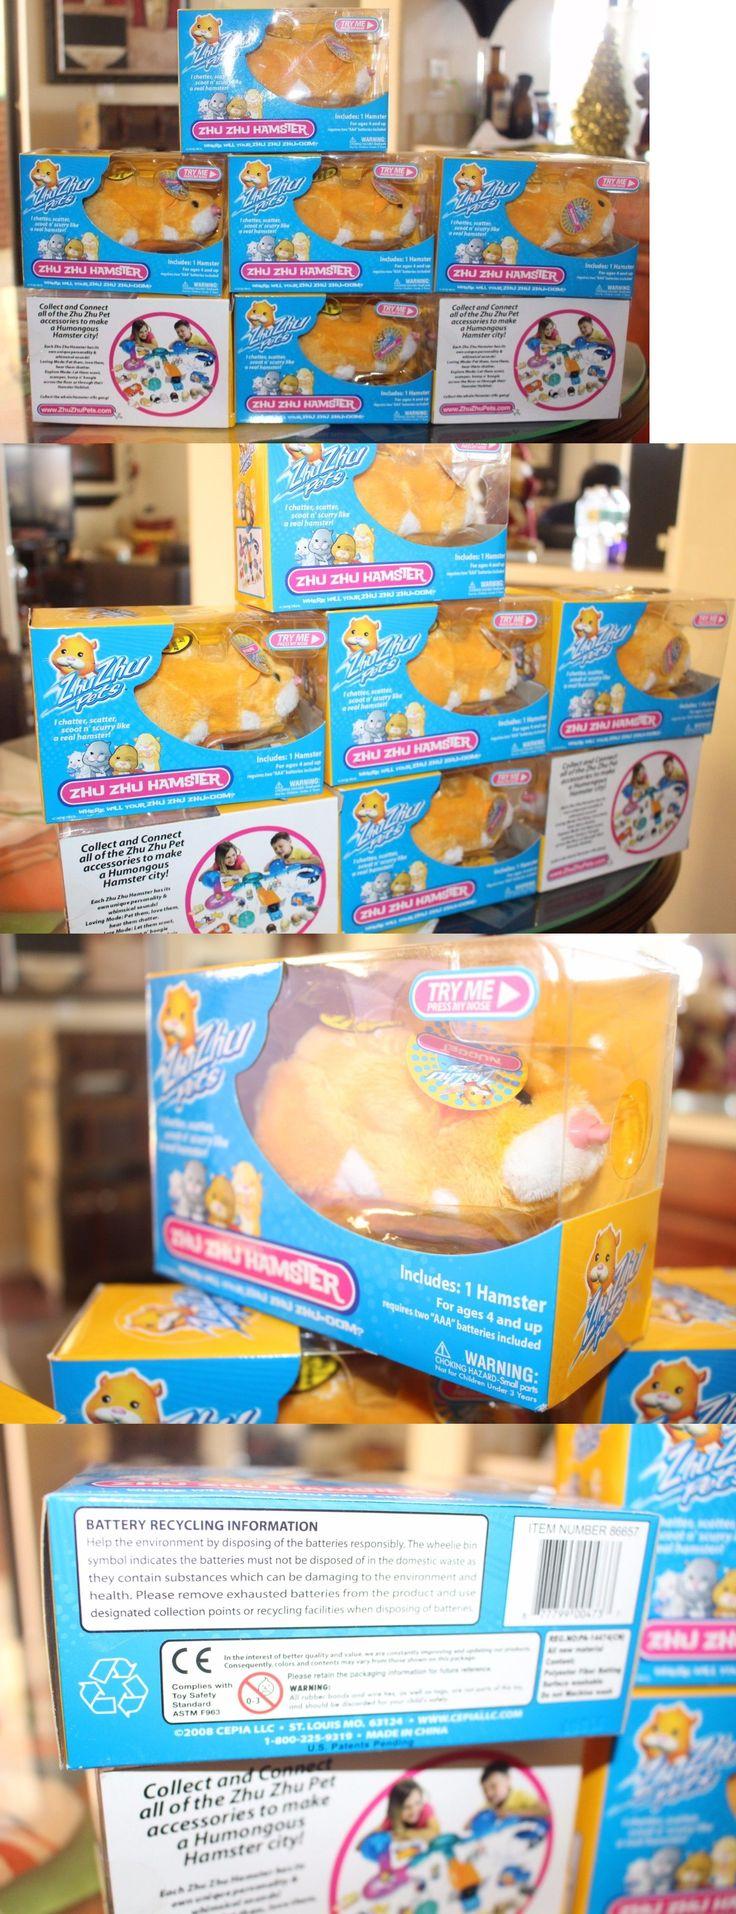 Zhu Zhu Pets 171529: New Lot Of 7 Zhu Zhu Hamster Pet Nugget (Rare Gold And White) 2008 -> BUY IT NOW ONLY: $35 on eBay!